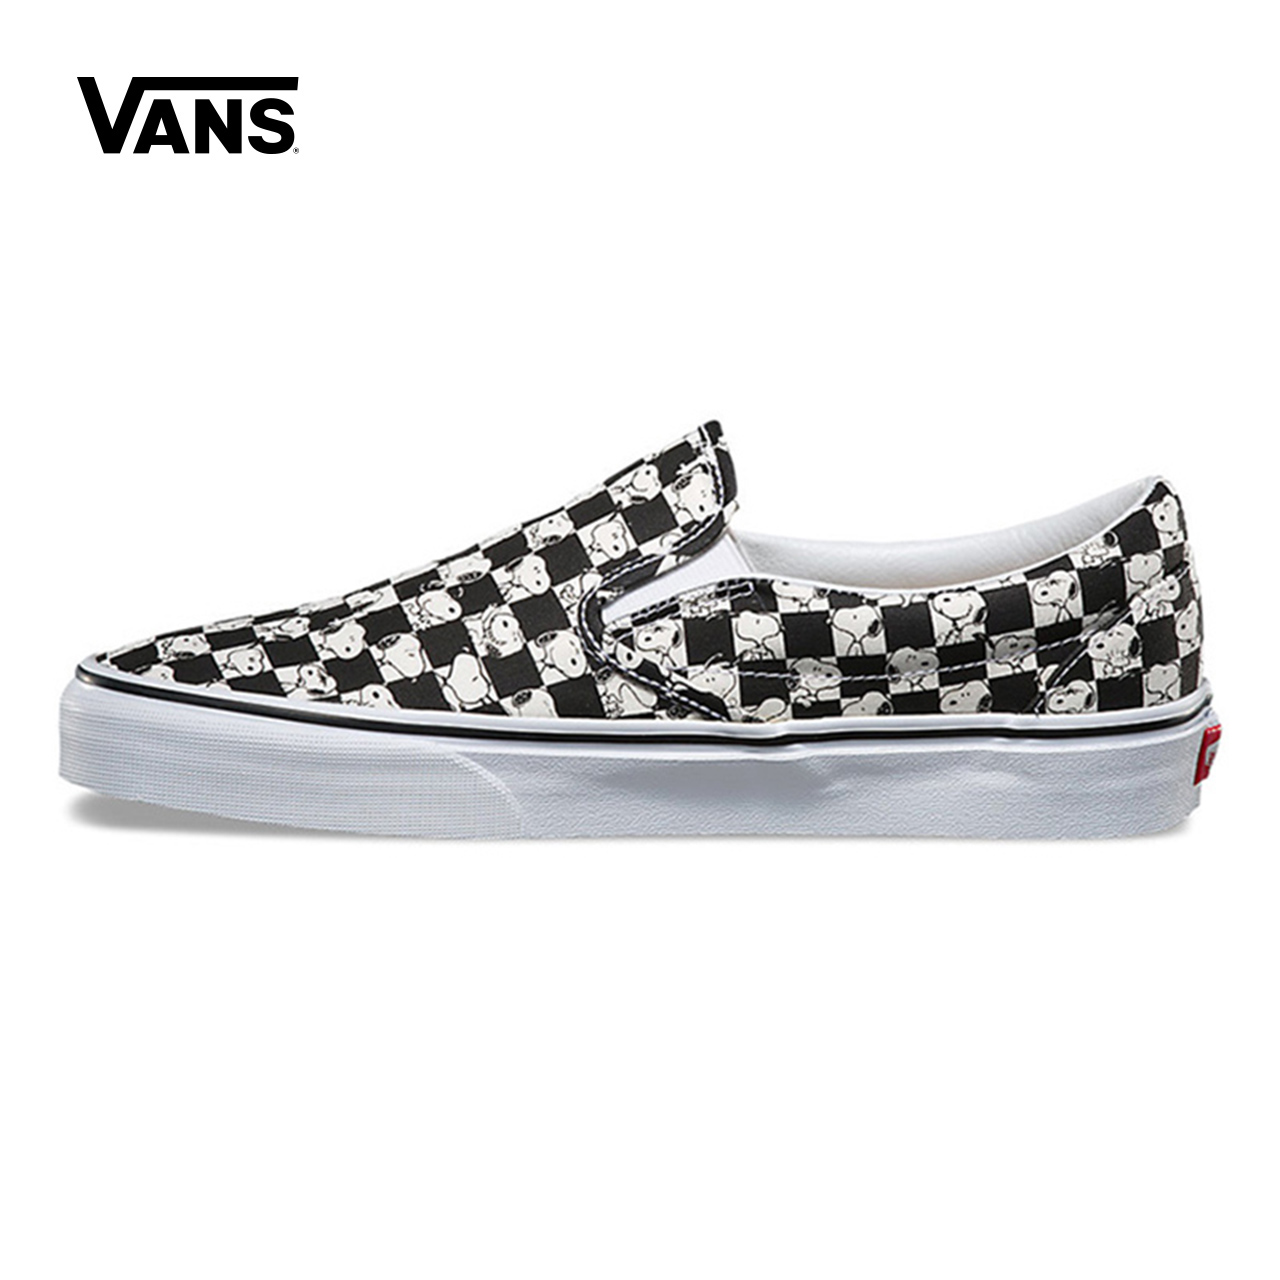 Original New Arrival Vans Men's & Women's Peanuts Slip-On Low-top Skateboarding Shoes Sneakers Canvas Sport Outdoor VN0A38F7QQO suede low top slip on sneakers